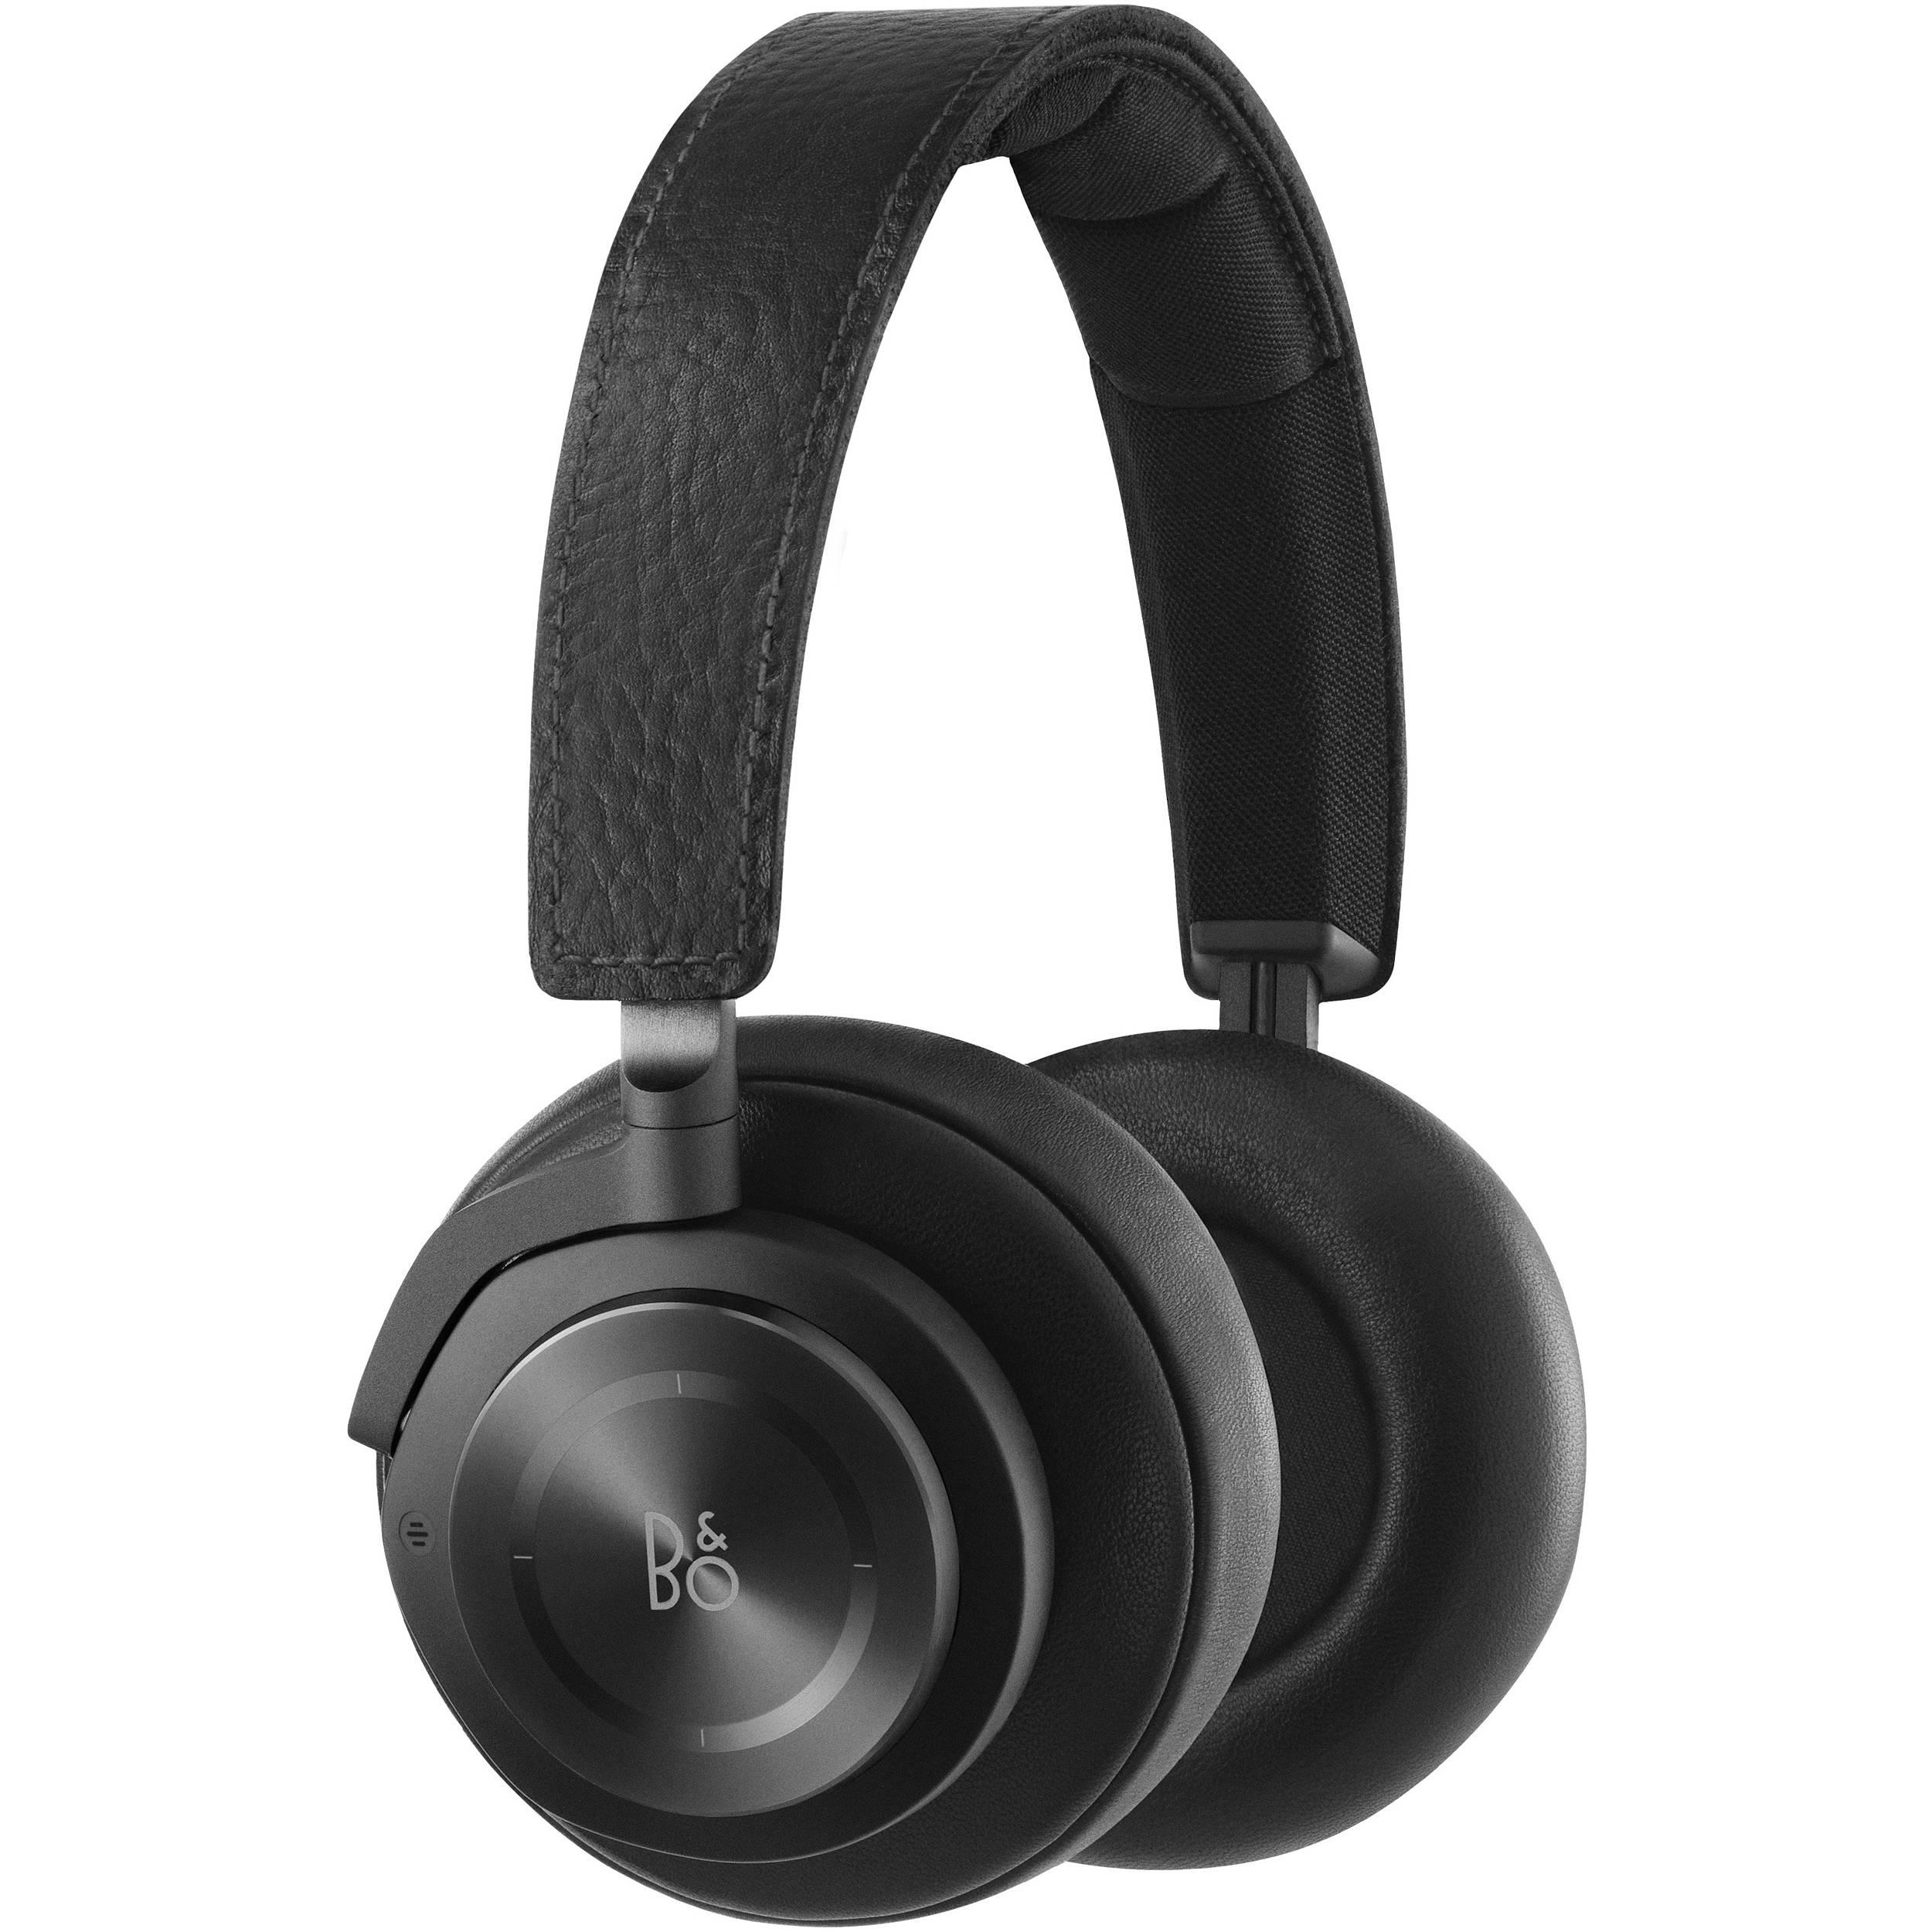 bb3e45881e3 Bang & Olufsen Beoplay H9 Wireless Noise-Canceling 1643626 B&H